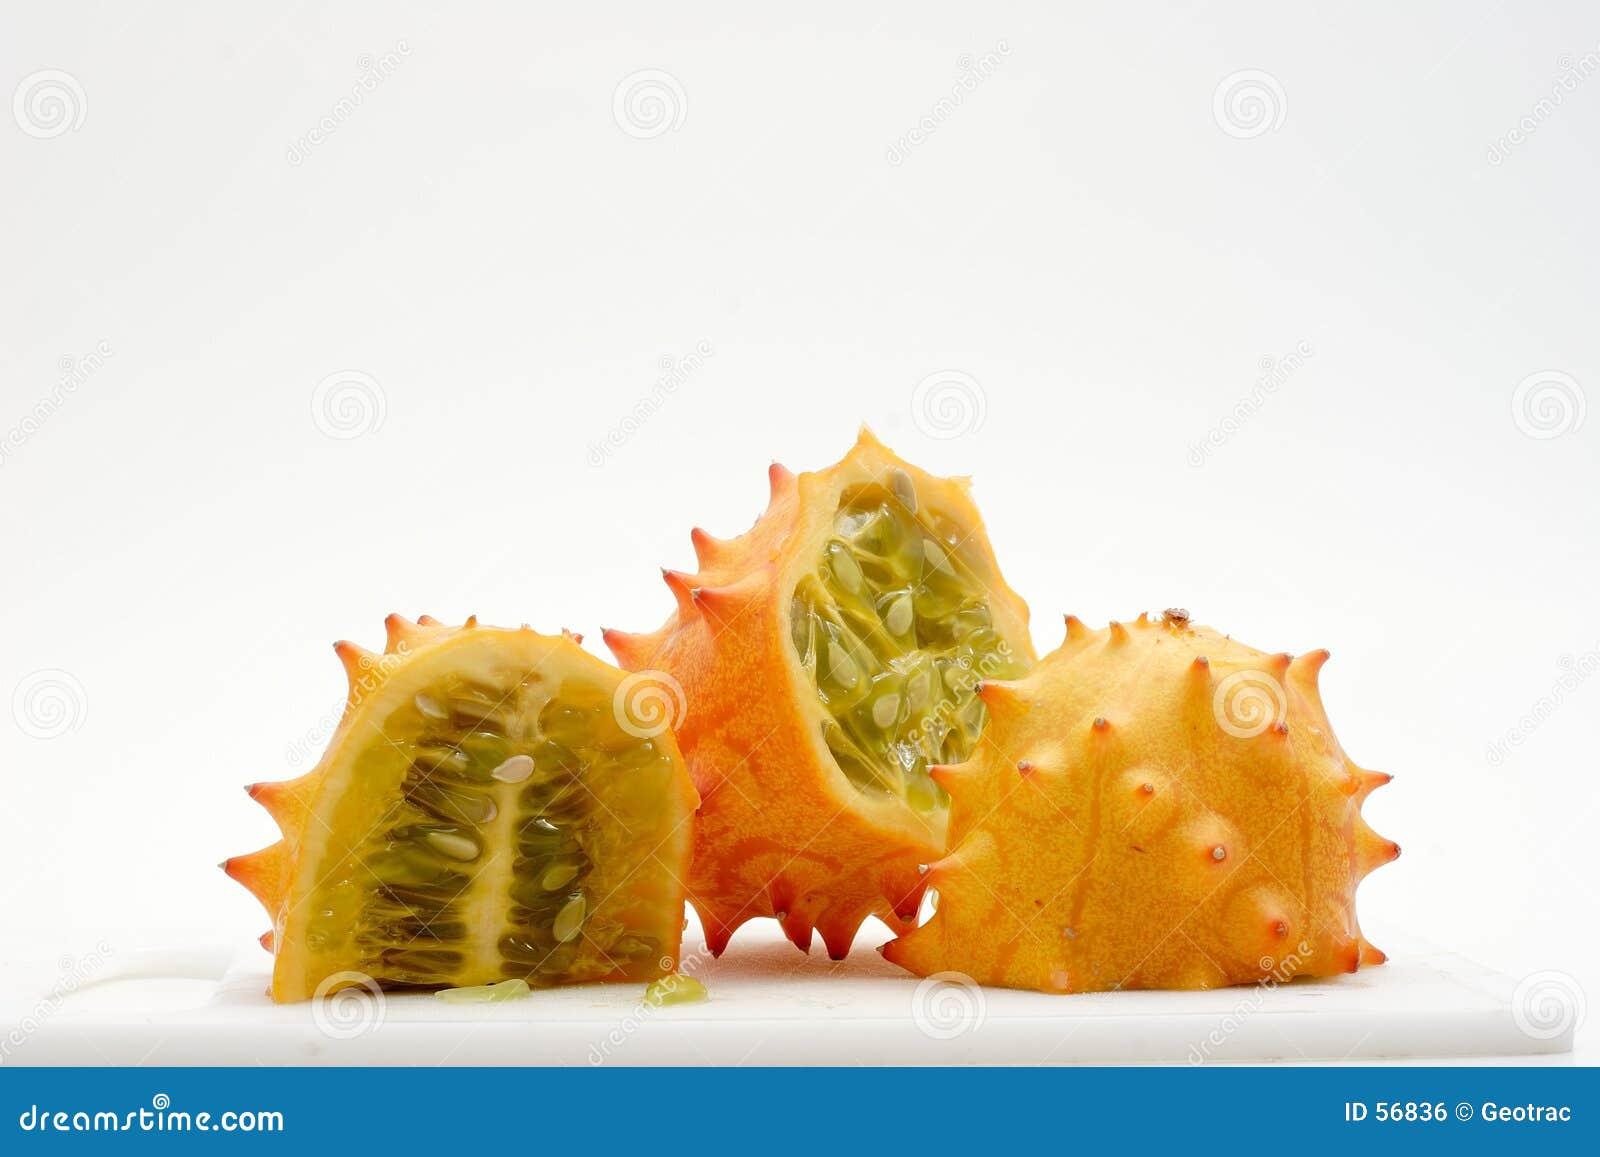 Exotic fruit slices